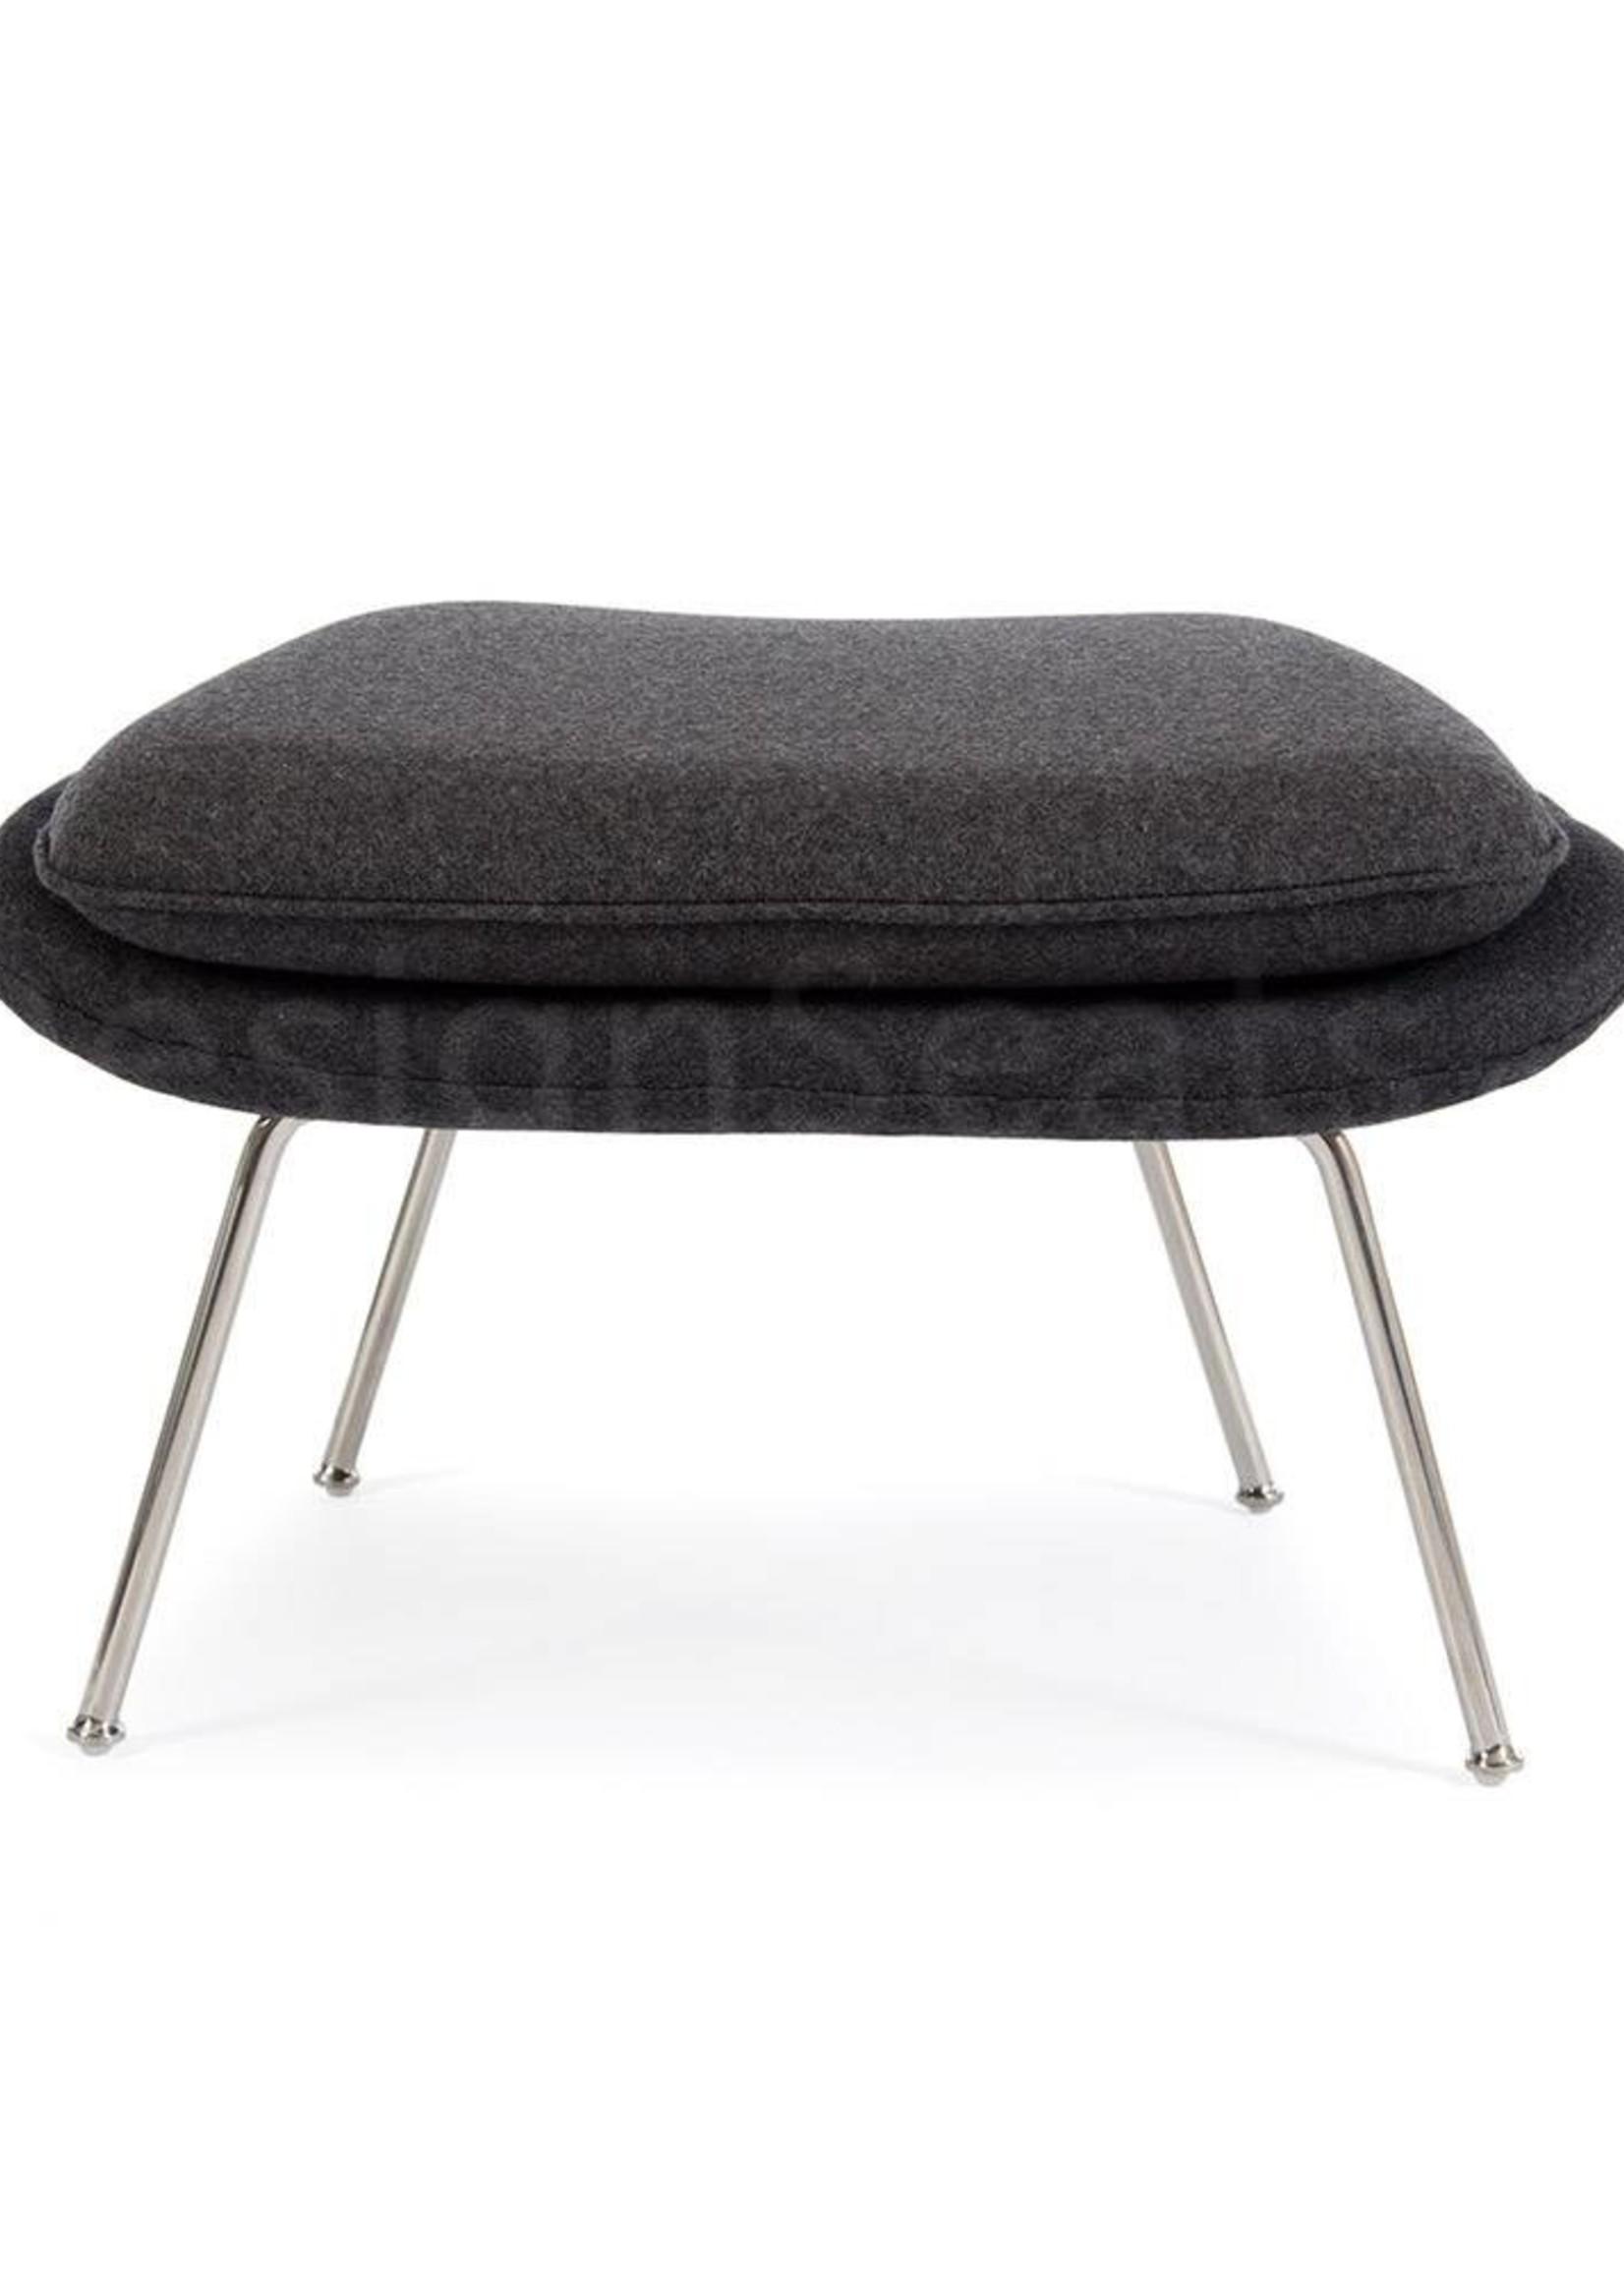 Womb chair Grijs